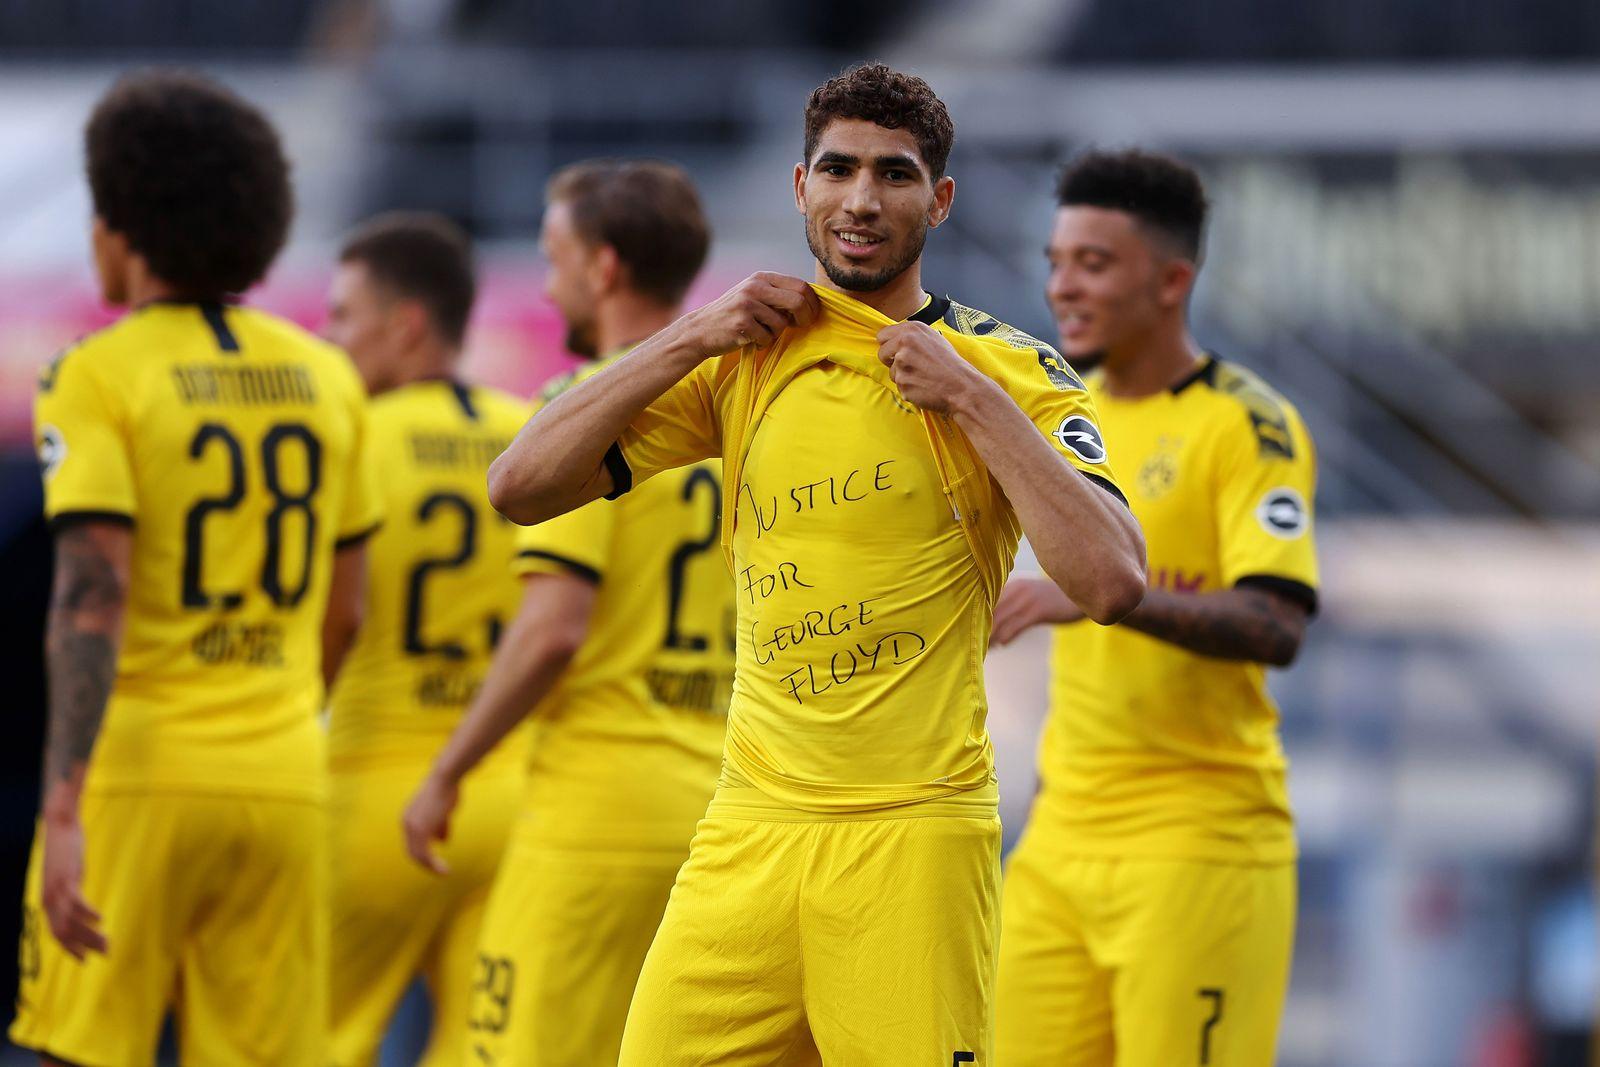 SC Paderborn 07 v Borussia Dortmund, Germany - 31 May 2020